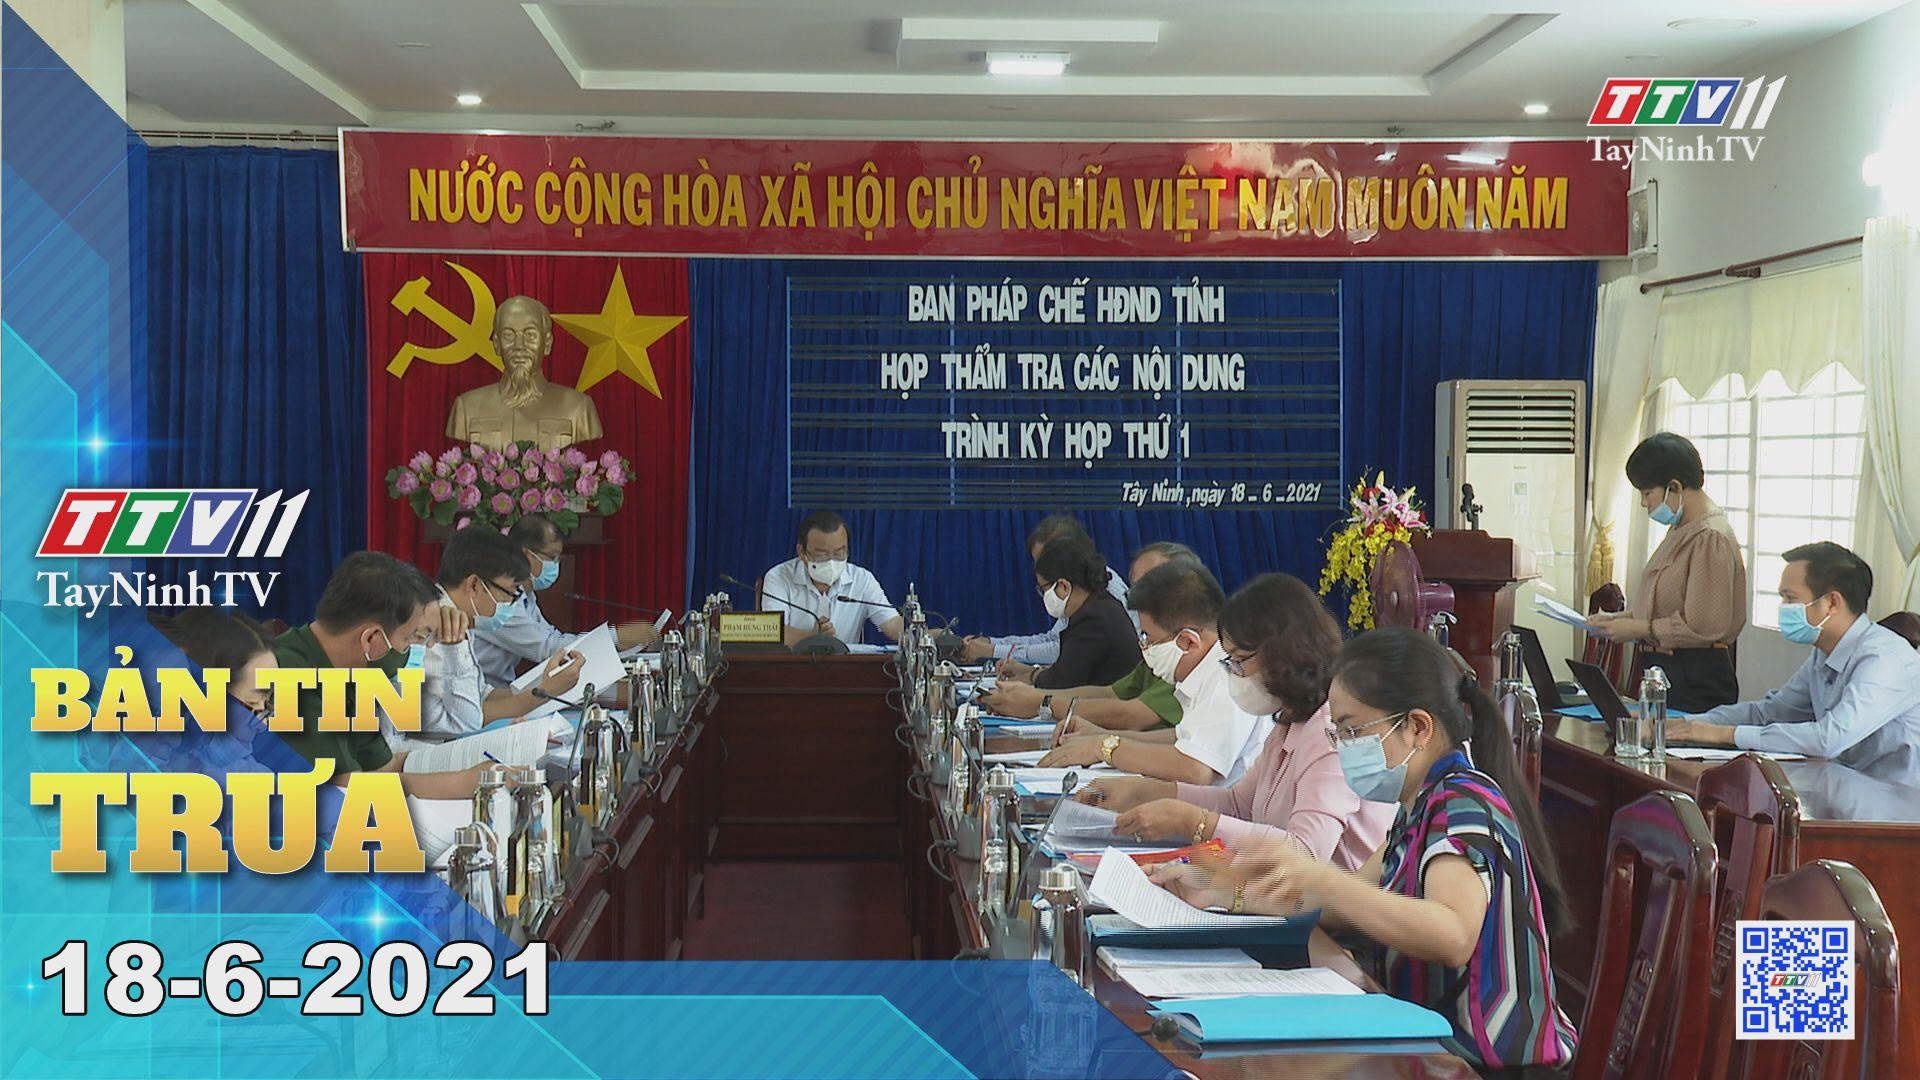 Bản tin trưa 18-6-2021 | Tin tức hôm nay | TayNinhTV